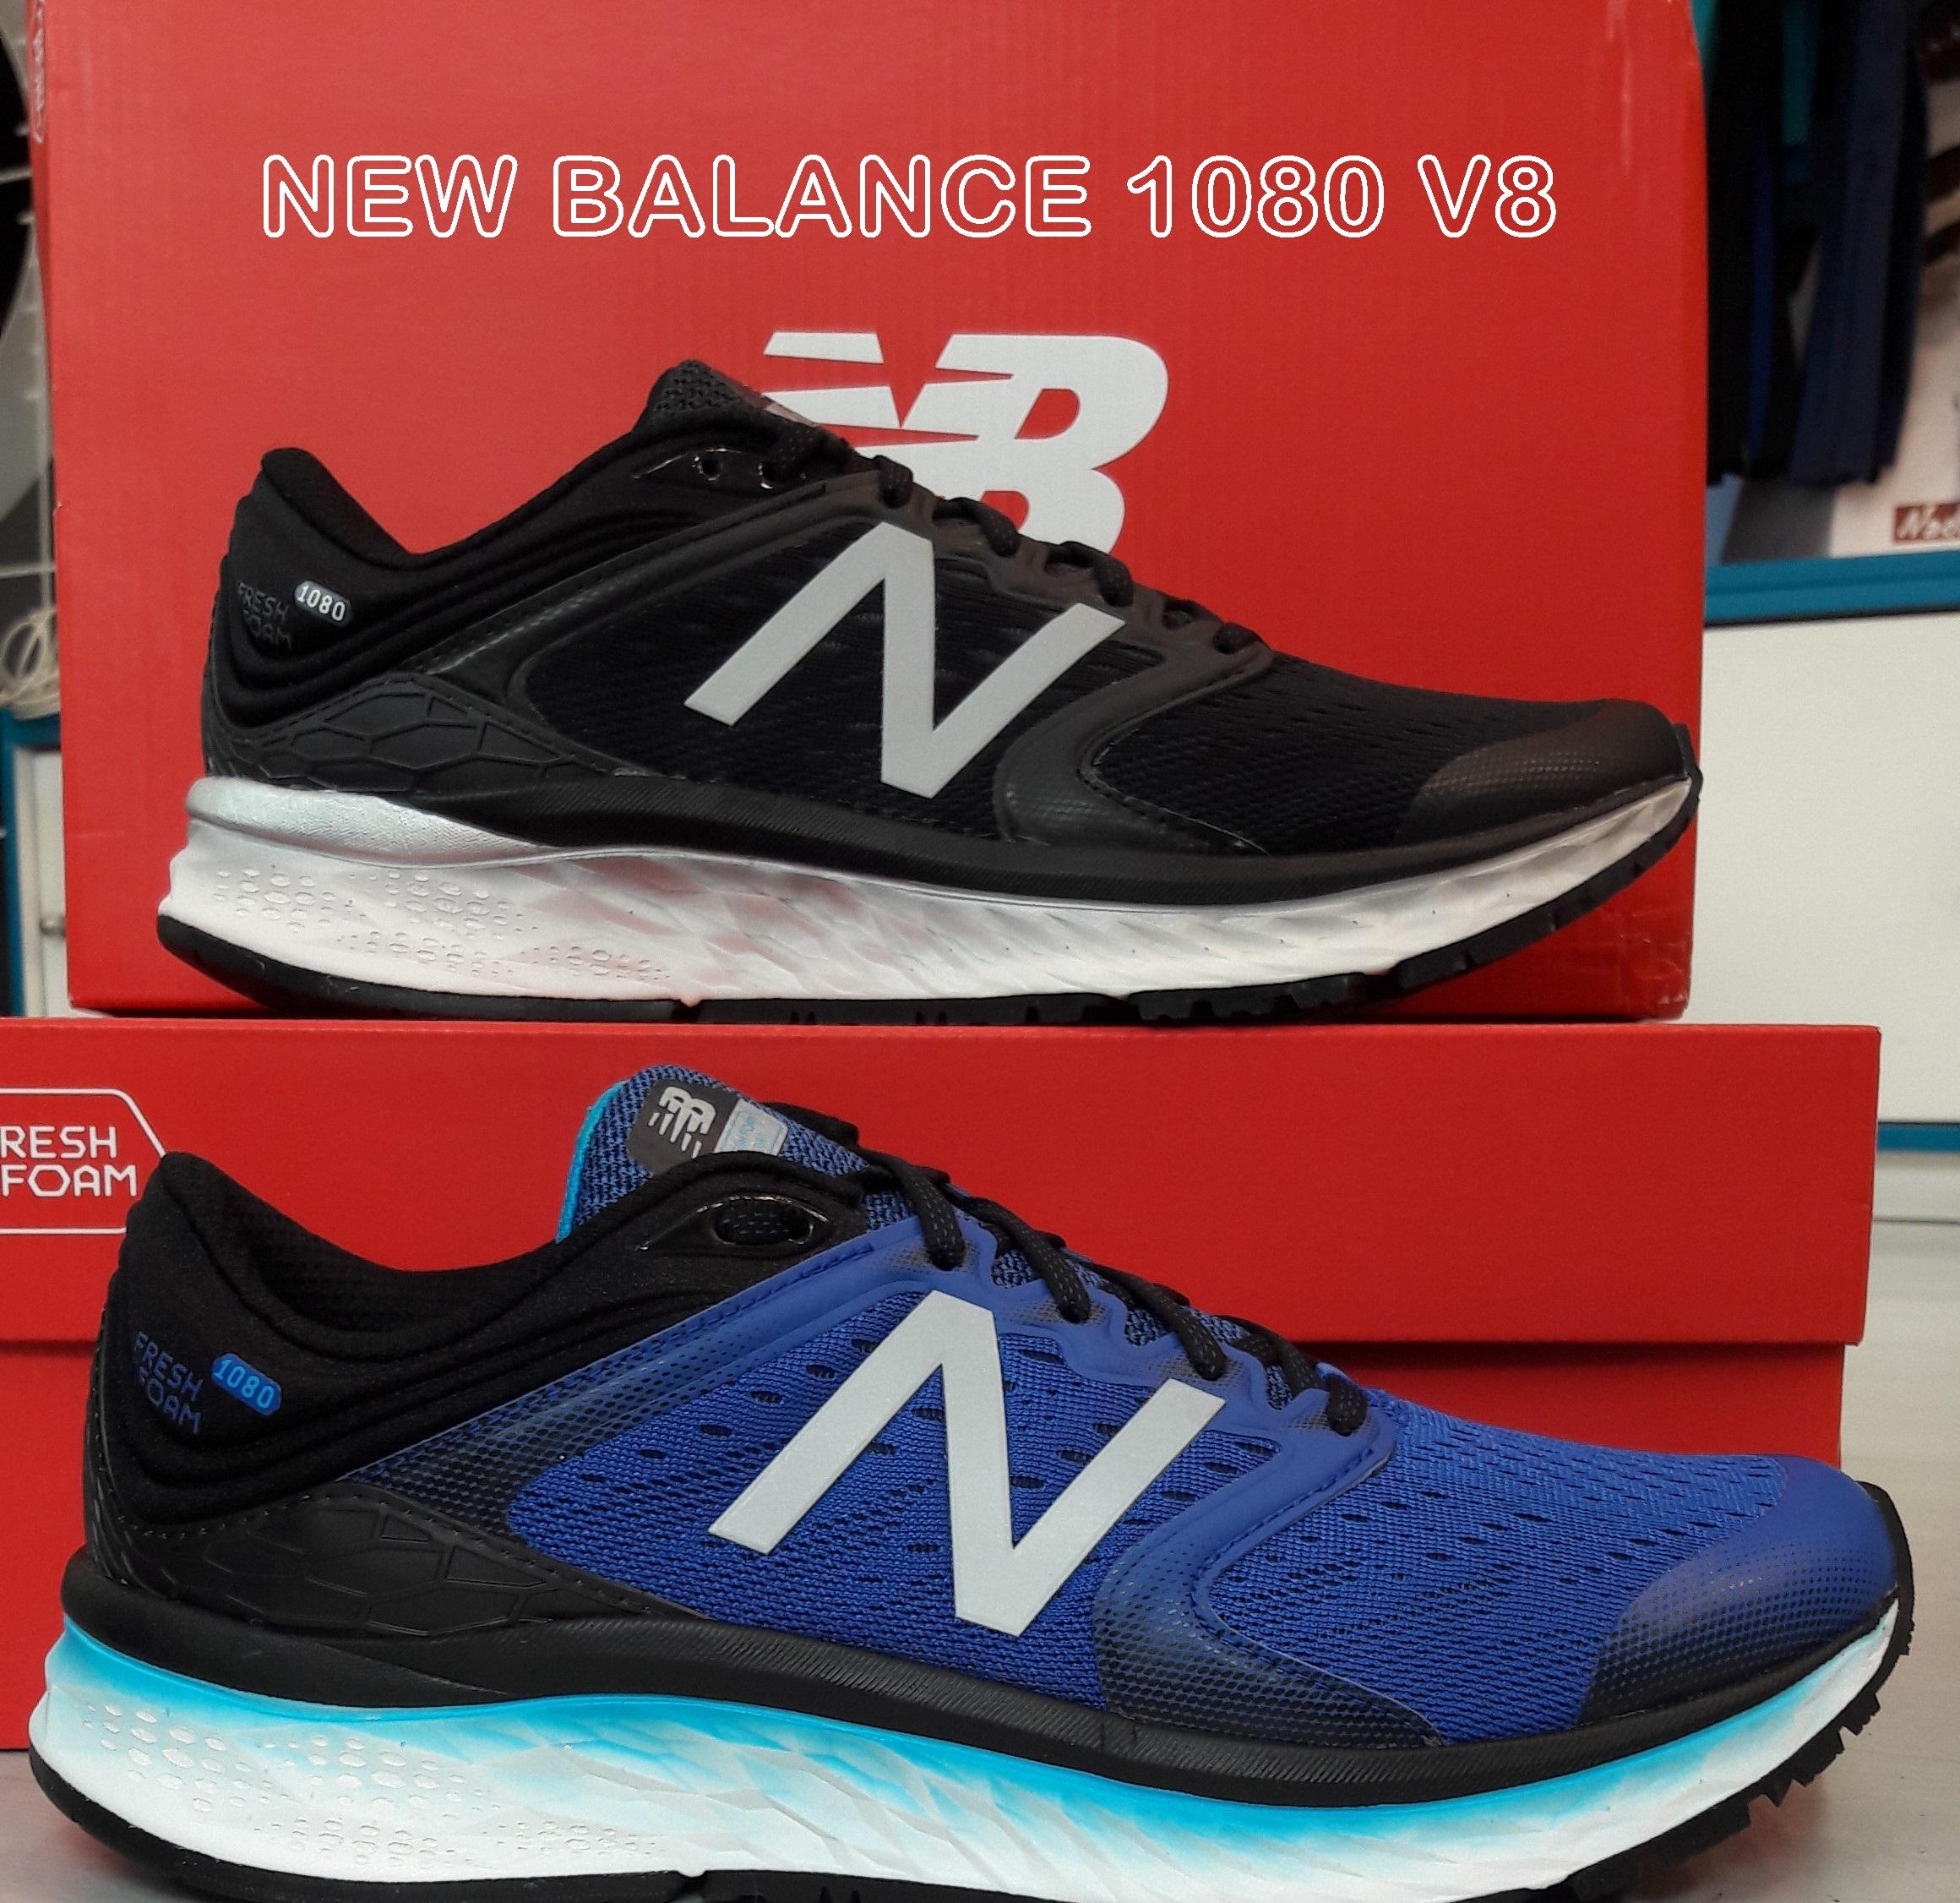 new balance-1080 v8